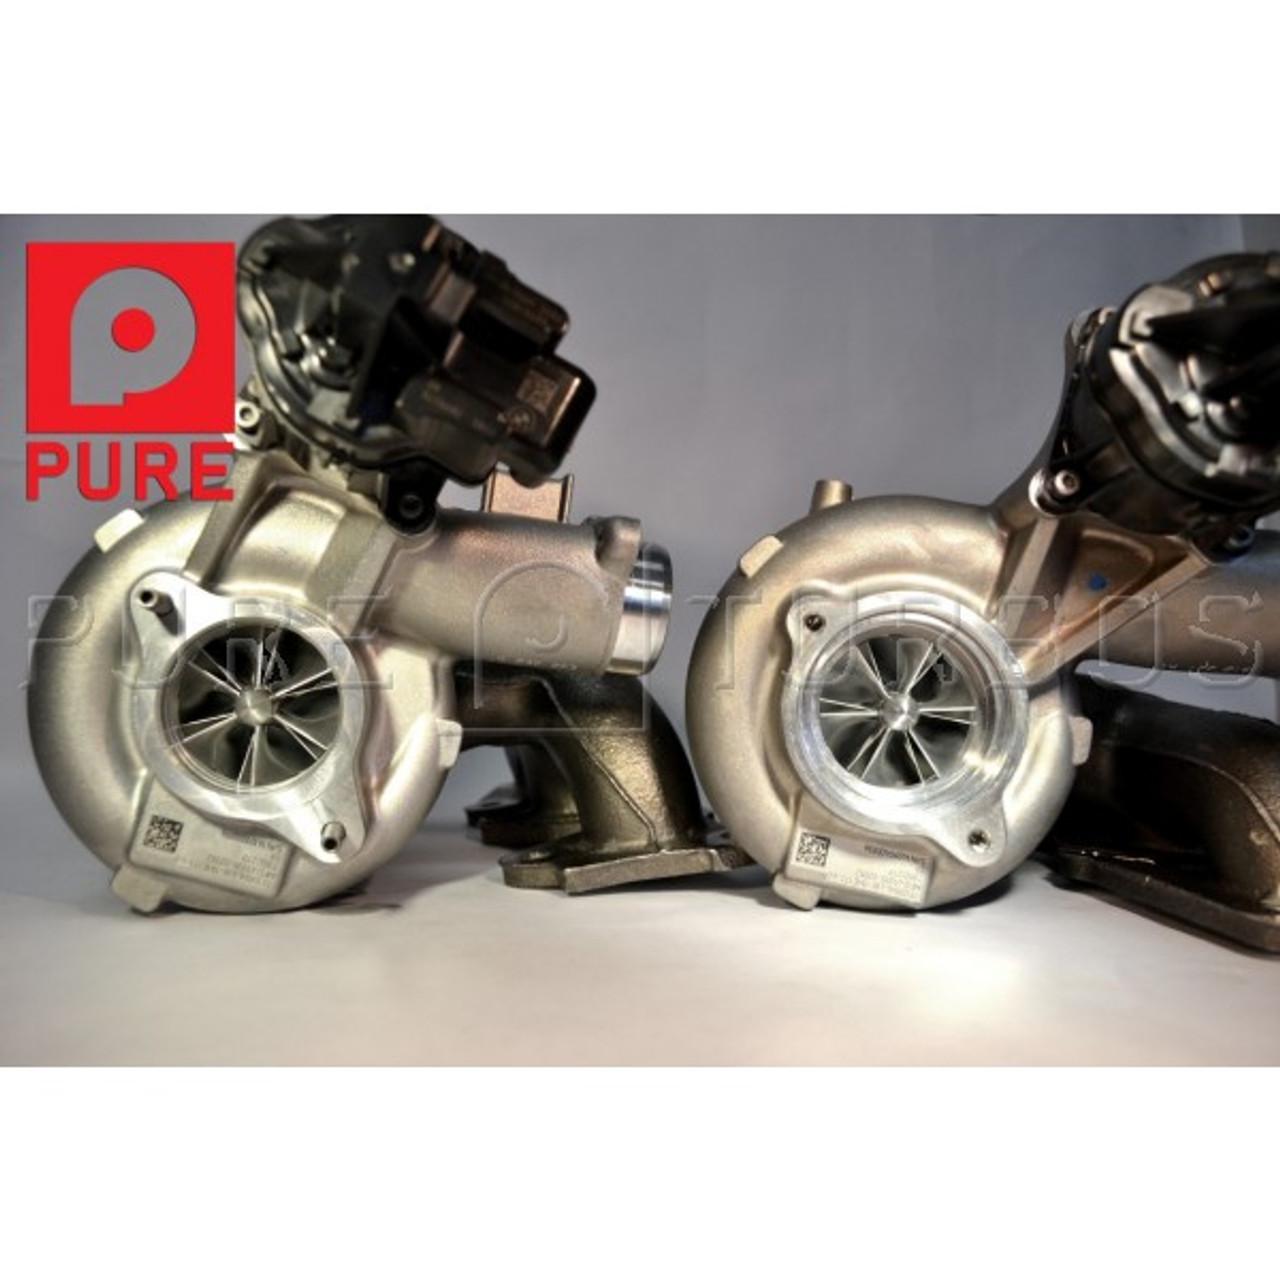 Pure Turbos BMW M3 / M4 (F80 / F82) Stage 2 HF Turbo Upgrade Kit